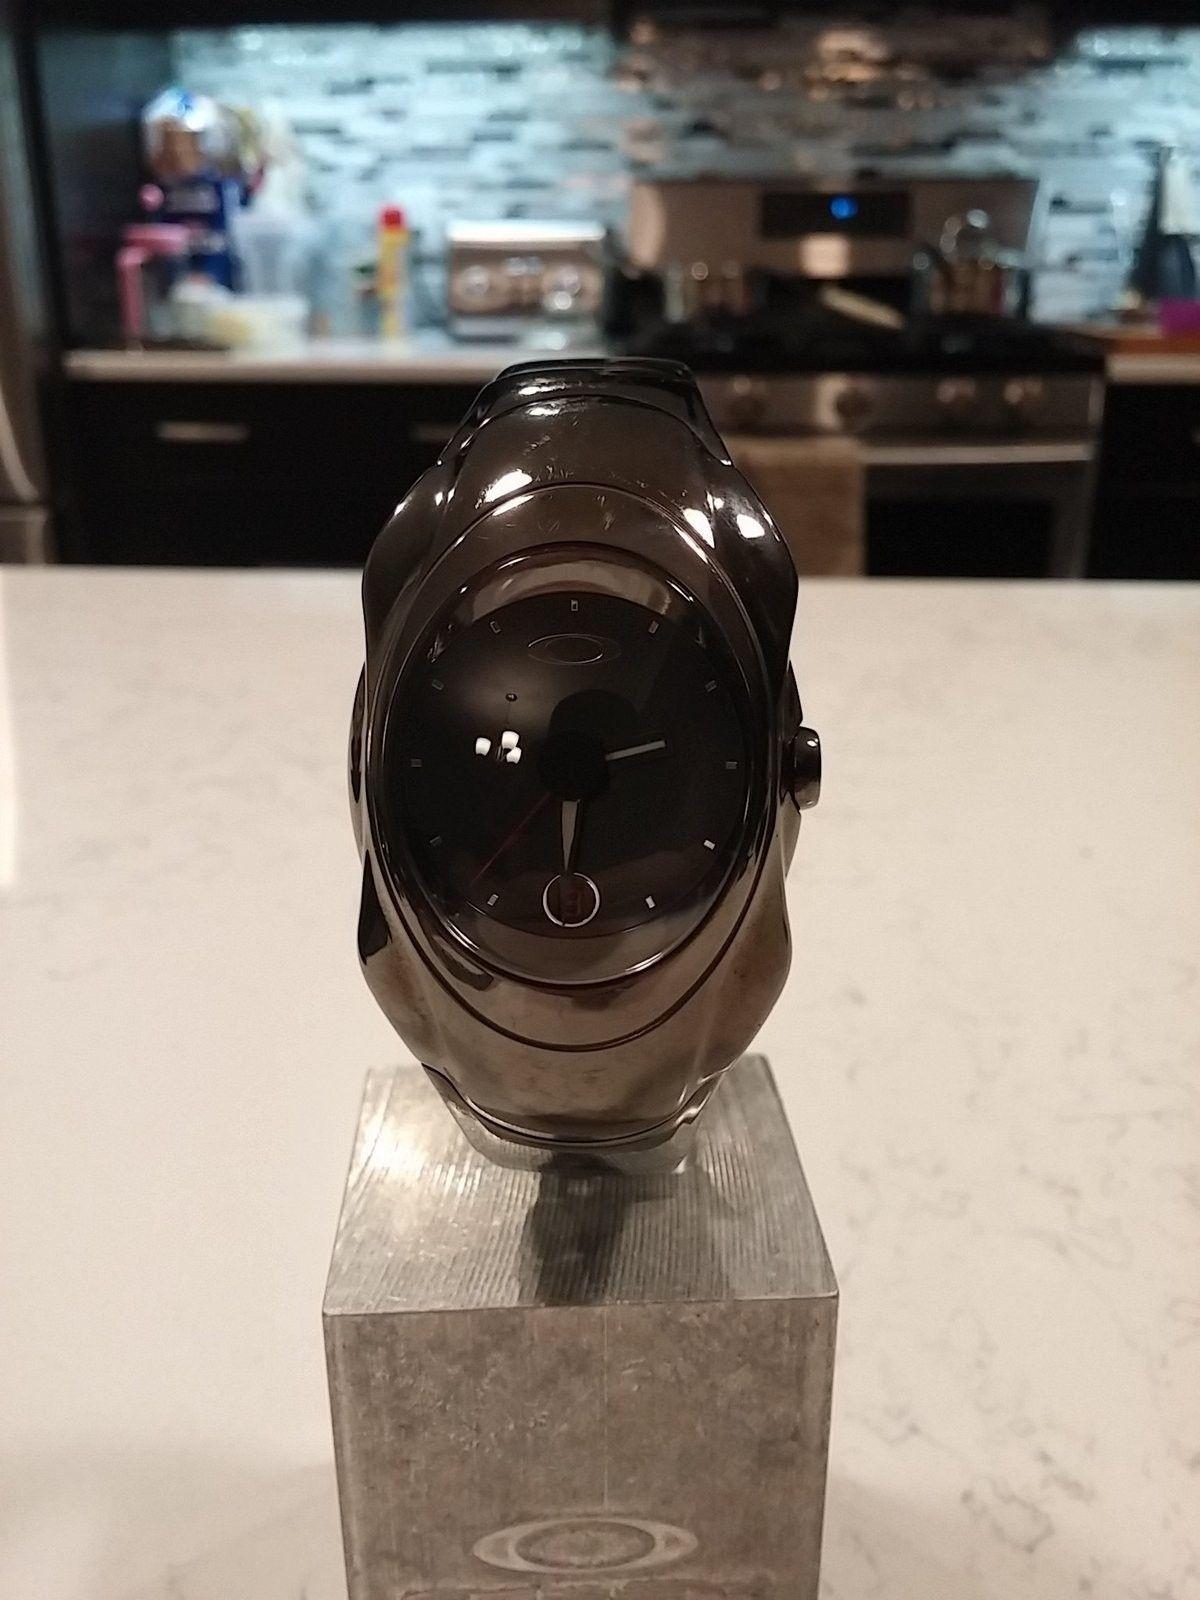 Watch Sale v2.0 - Timebomb x3, 12 Gauge, Minute Machine, Judge, Blade - 20150315_201258.jpg